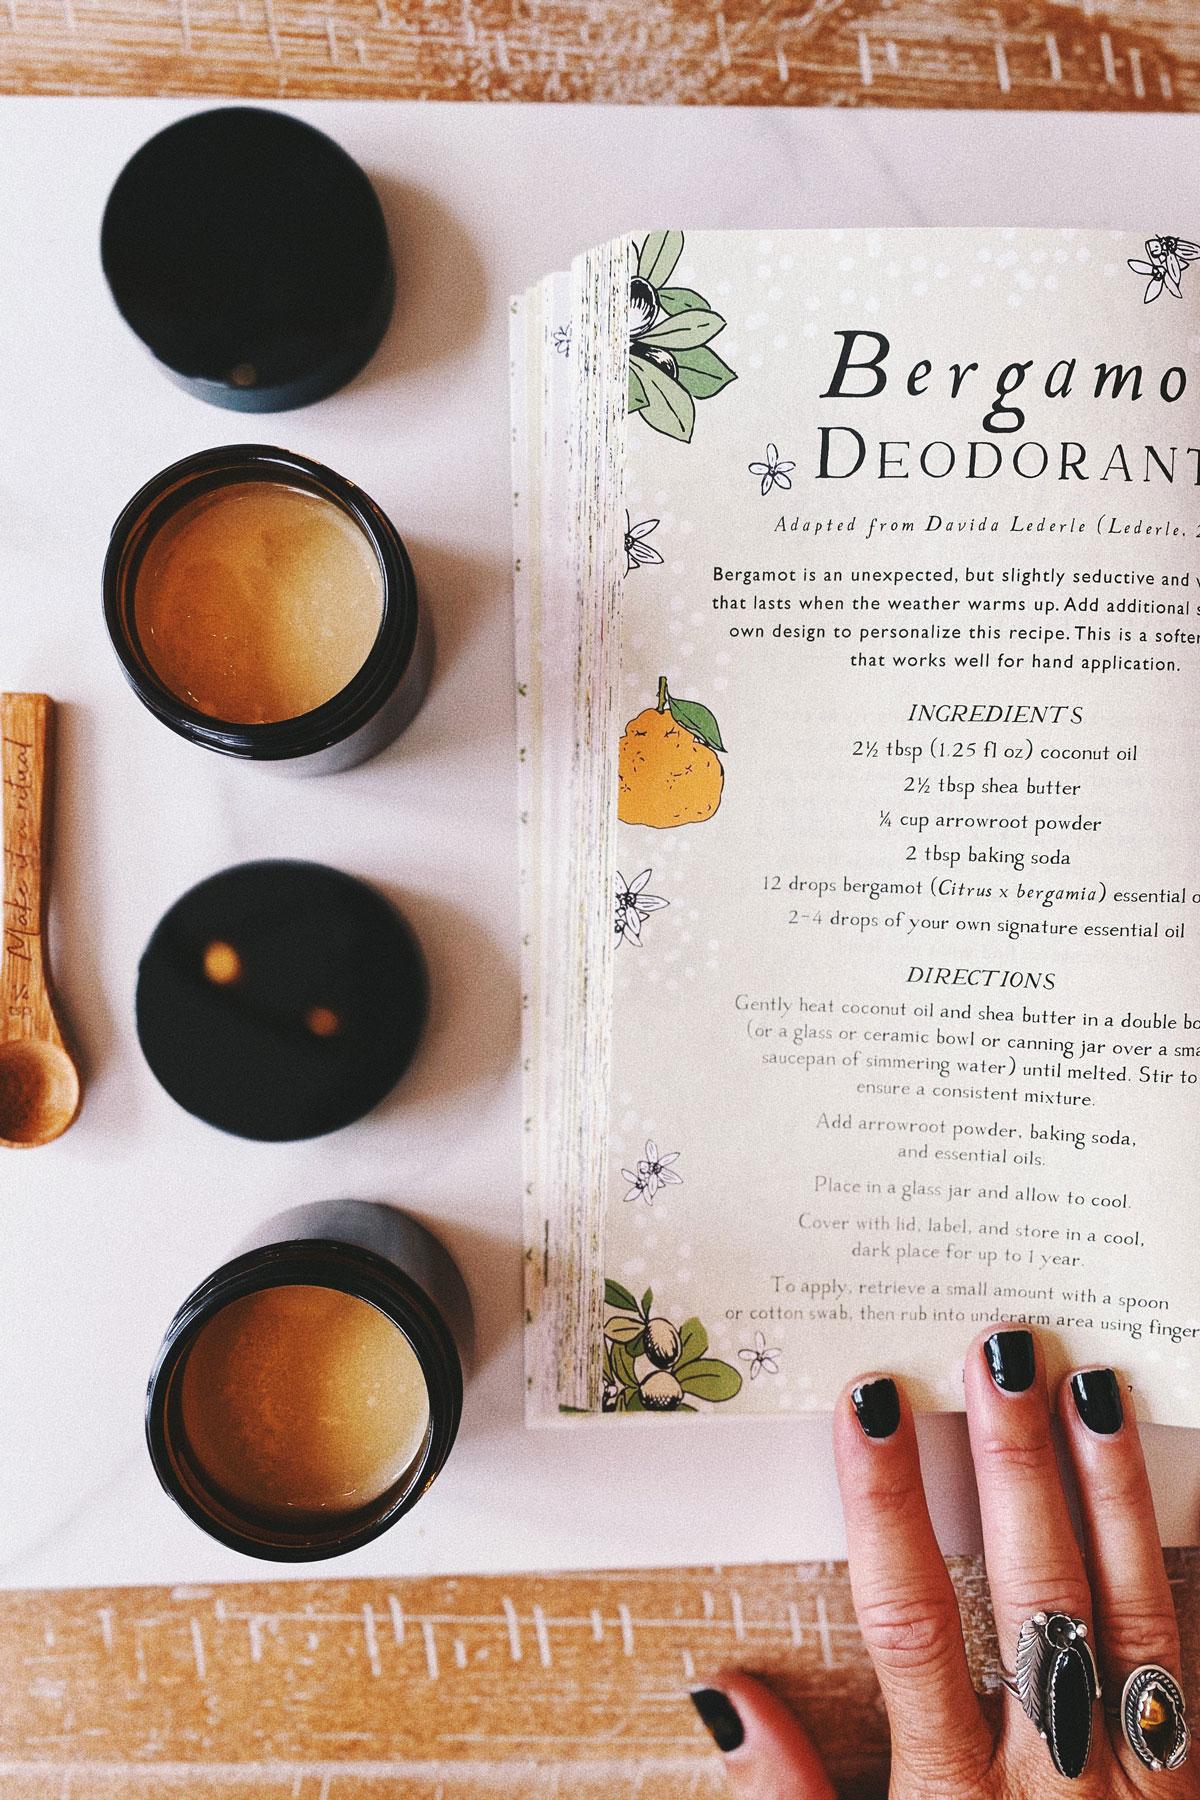 Heather Skasick making Bergamot Deodorant with Herbal Academy recipe